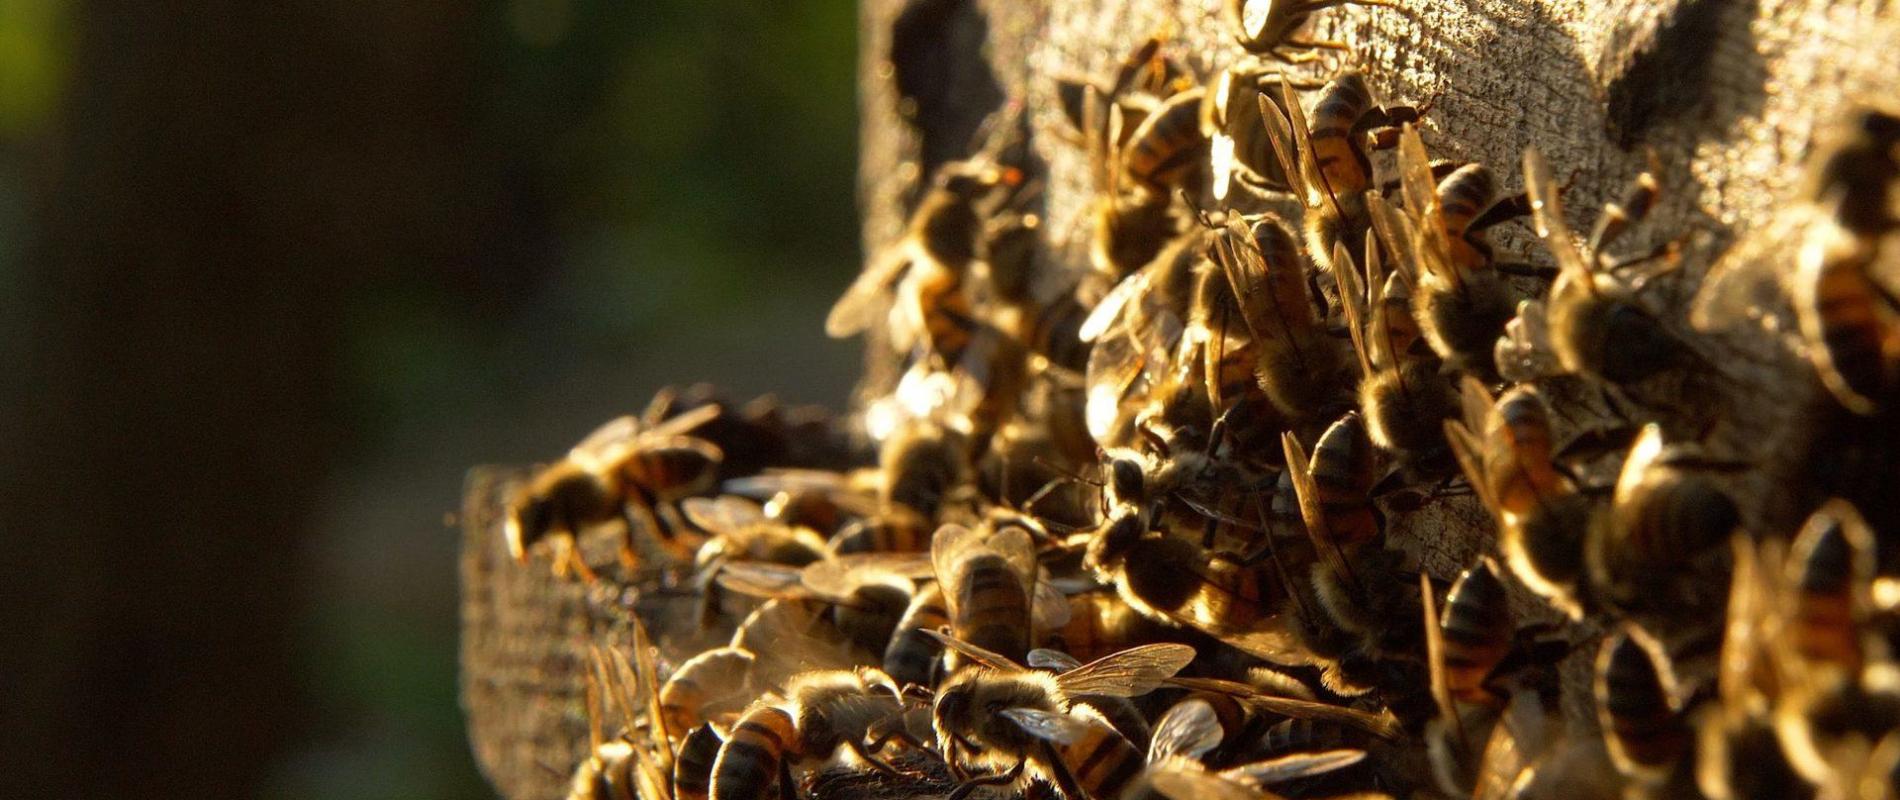 Mttd oeganda bijen algemeen 007